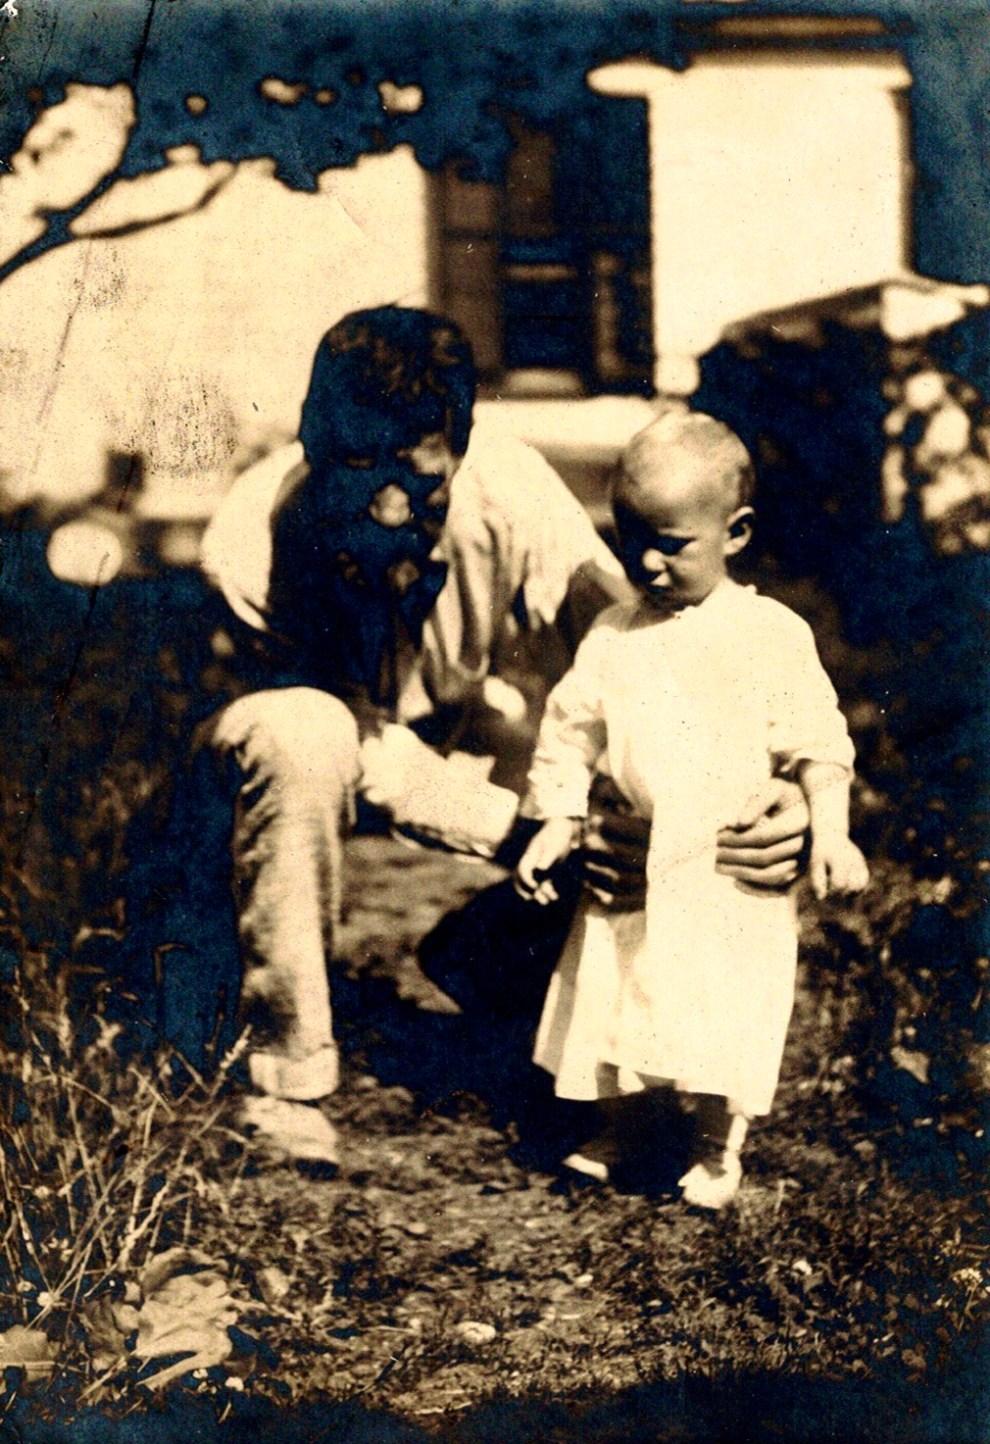 Emil Carlsen : Photograph of Emil & Dines Carlsen, ca.1903.